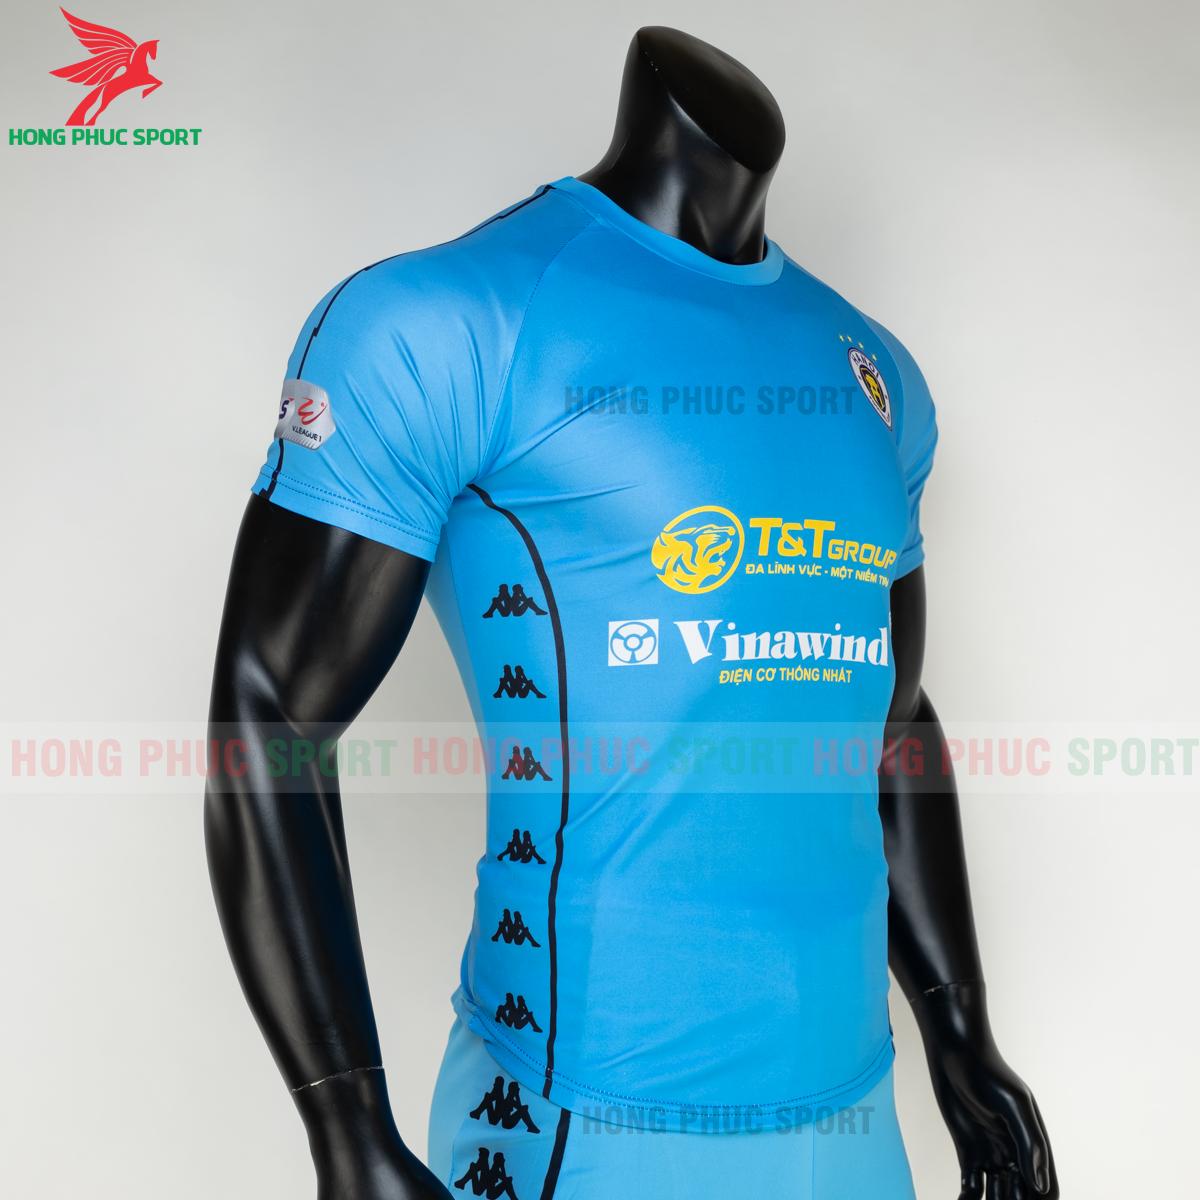 https://cdn.hongphucsport.com/unsafe/s4.shopbay.vn/files/285/ao-bong-da-ha-noi-fc-2021-xanh-ngoc-5-5fdd85cc20c9f.png